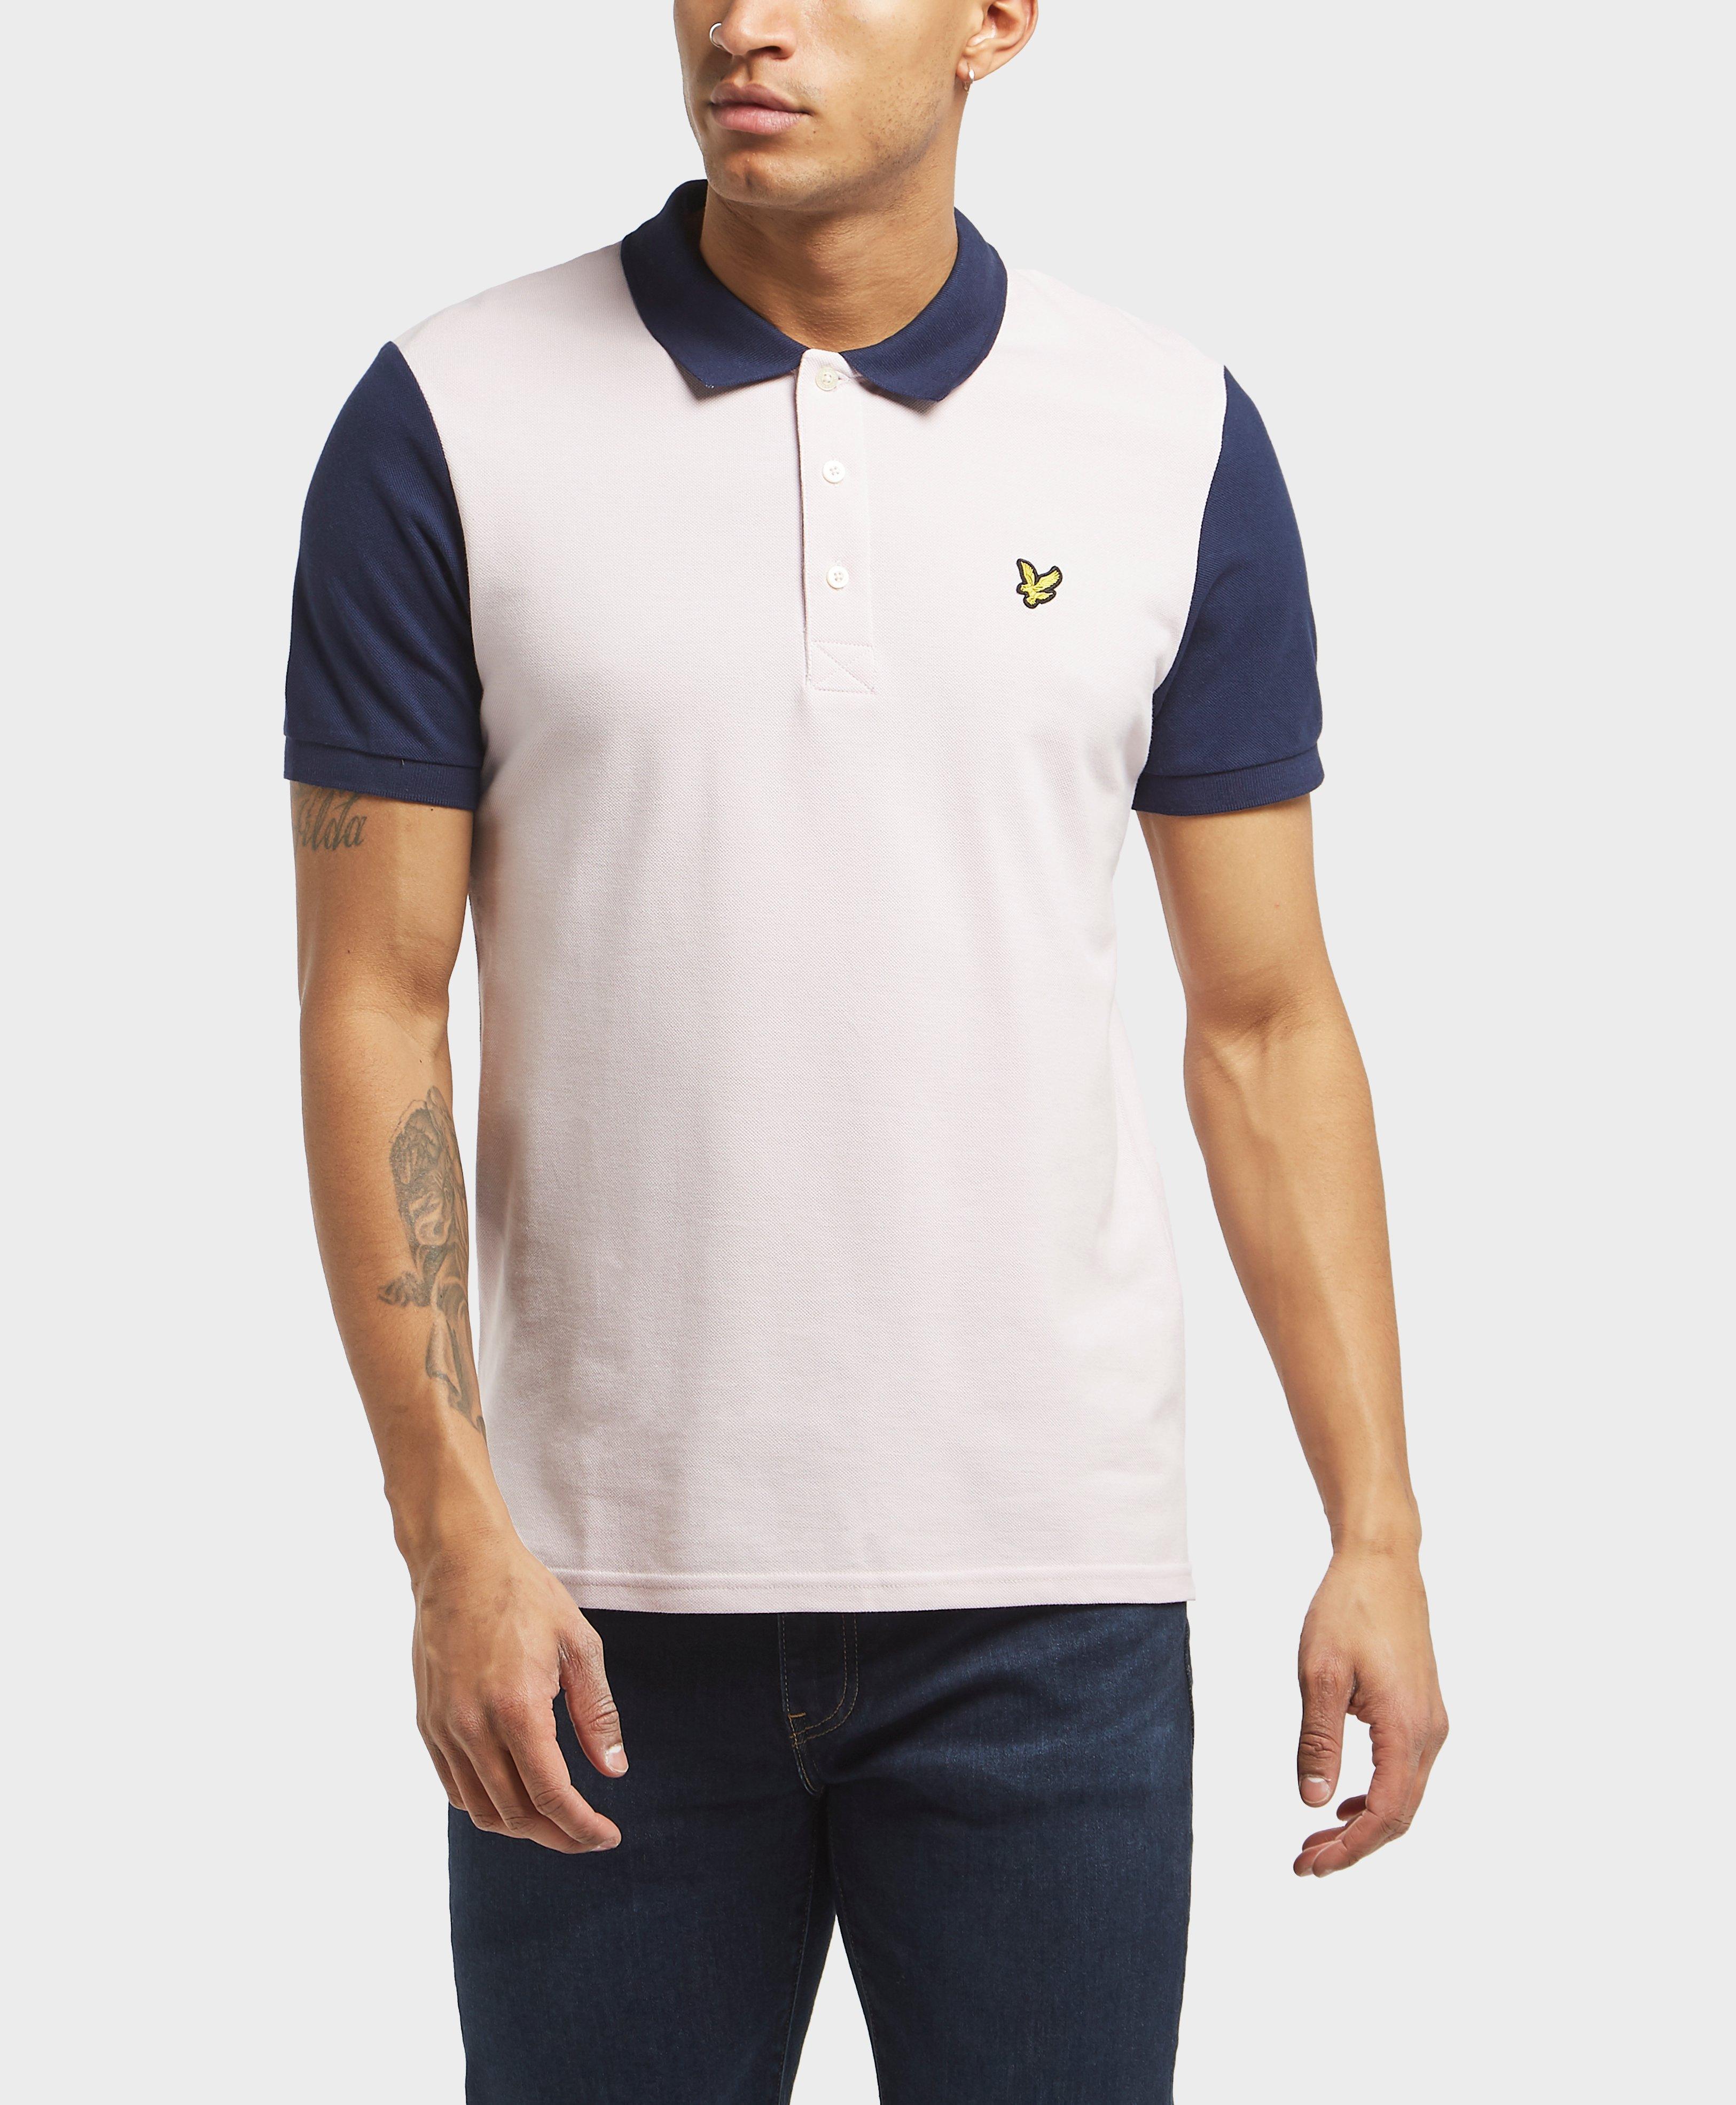 c2deae9fca9 Lyle   Scott Panel Short Sleeve Polo Shirt for Men - Lyst